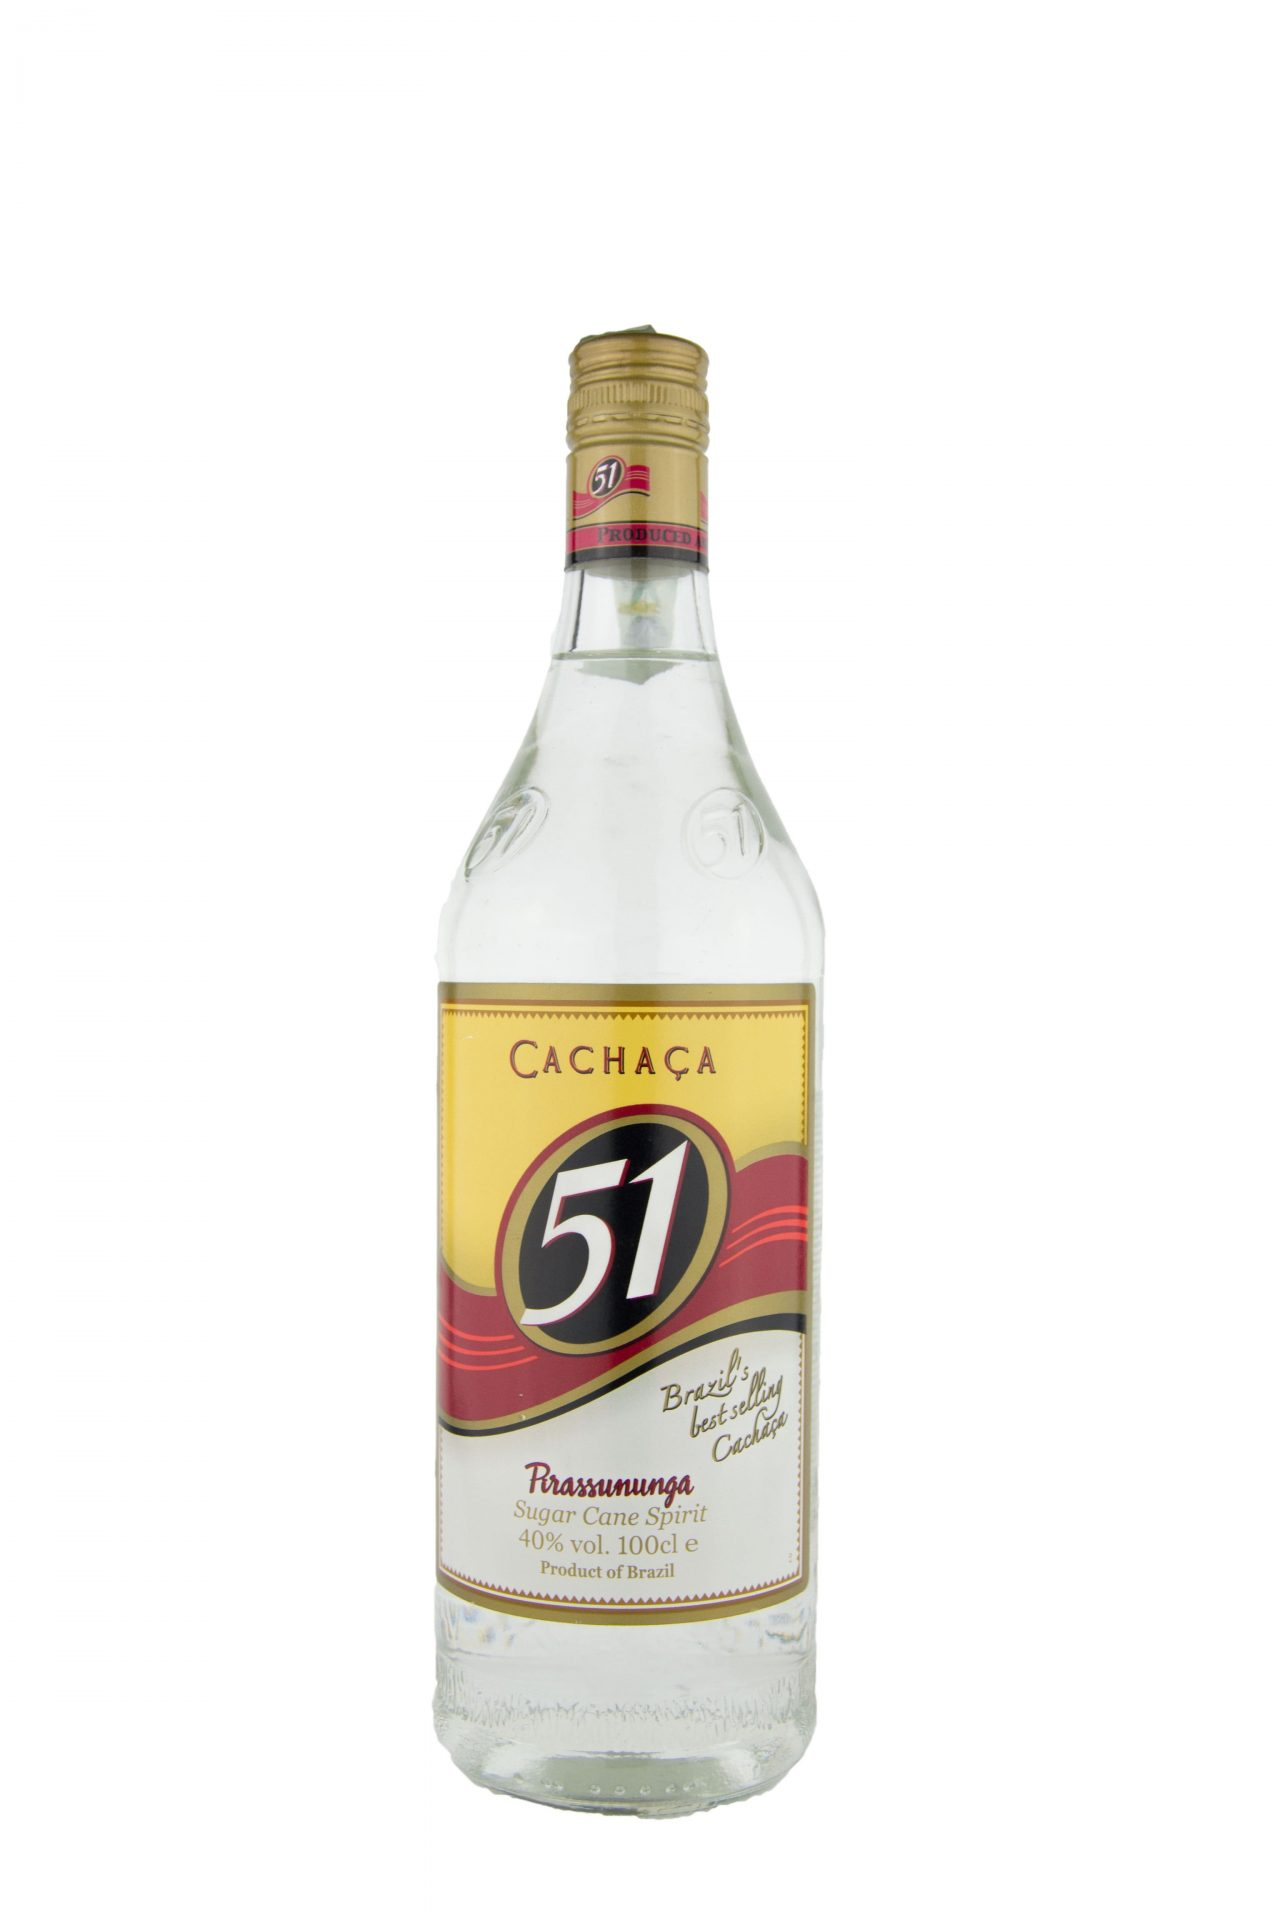 Cachaca 51 – Sugar Cane Spirit